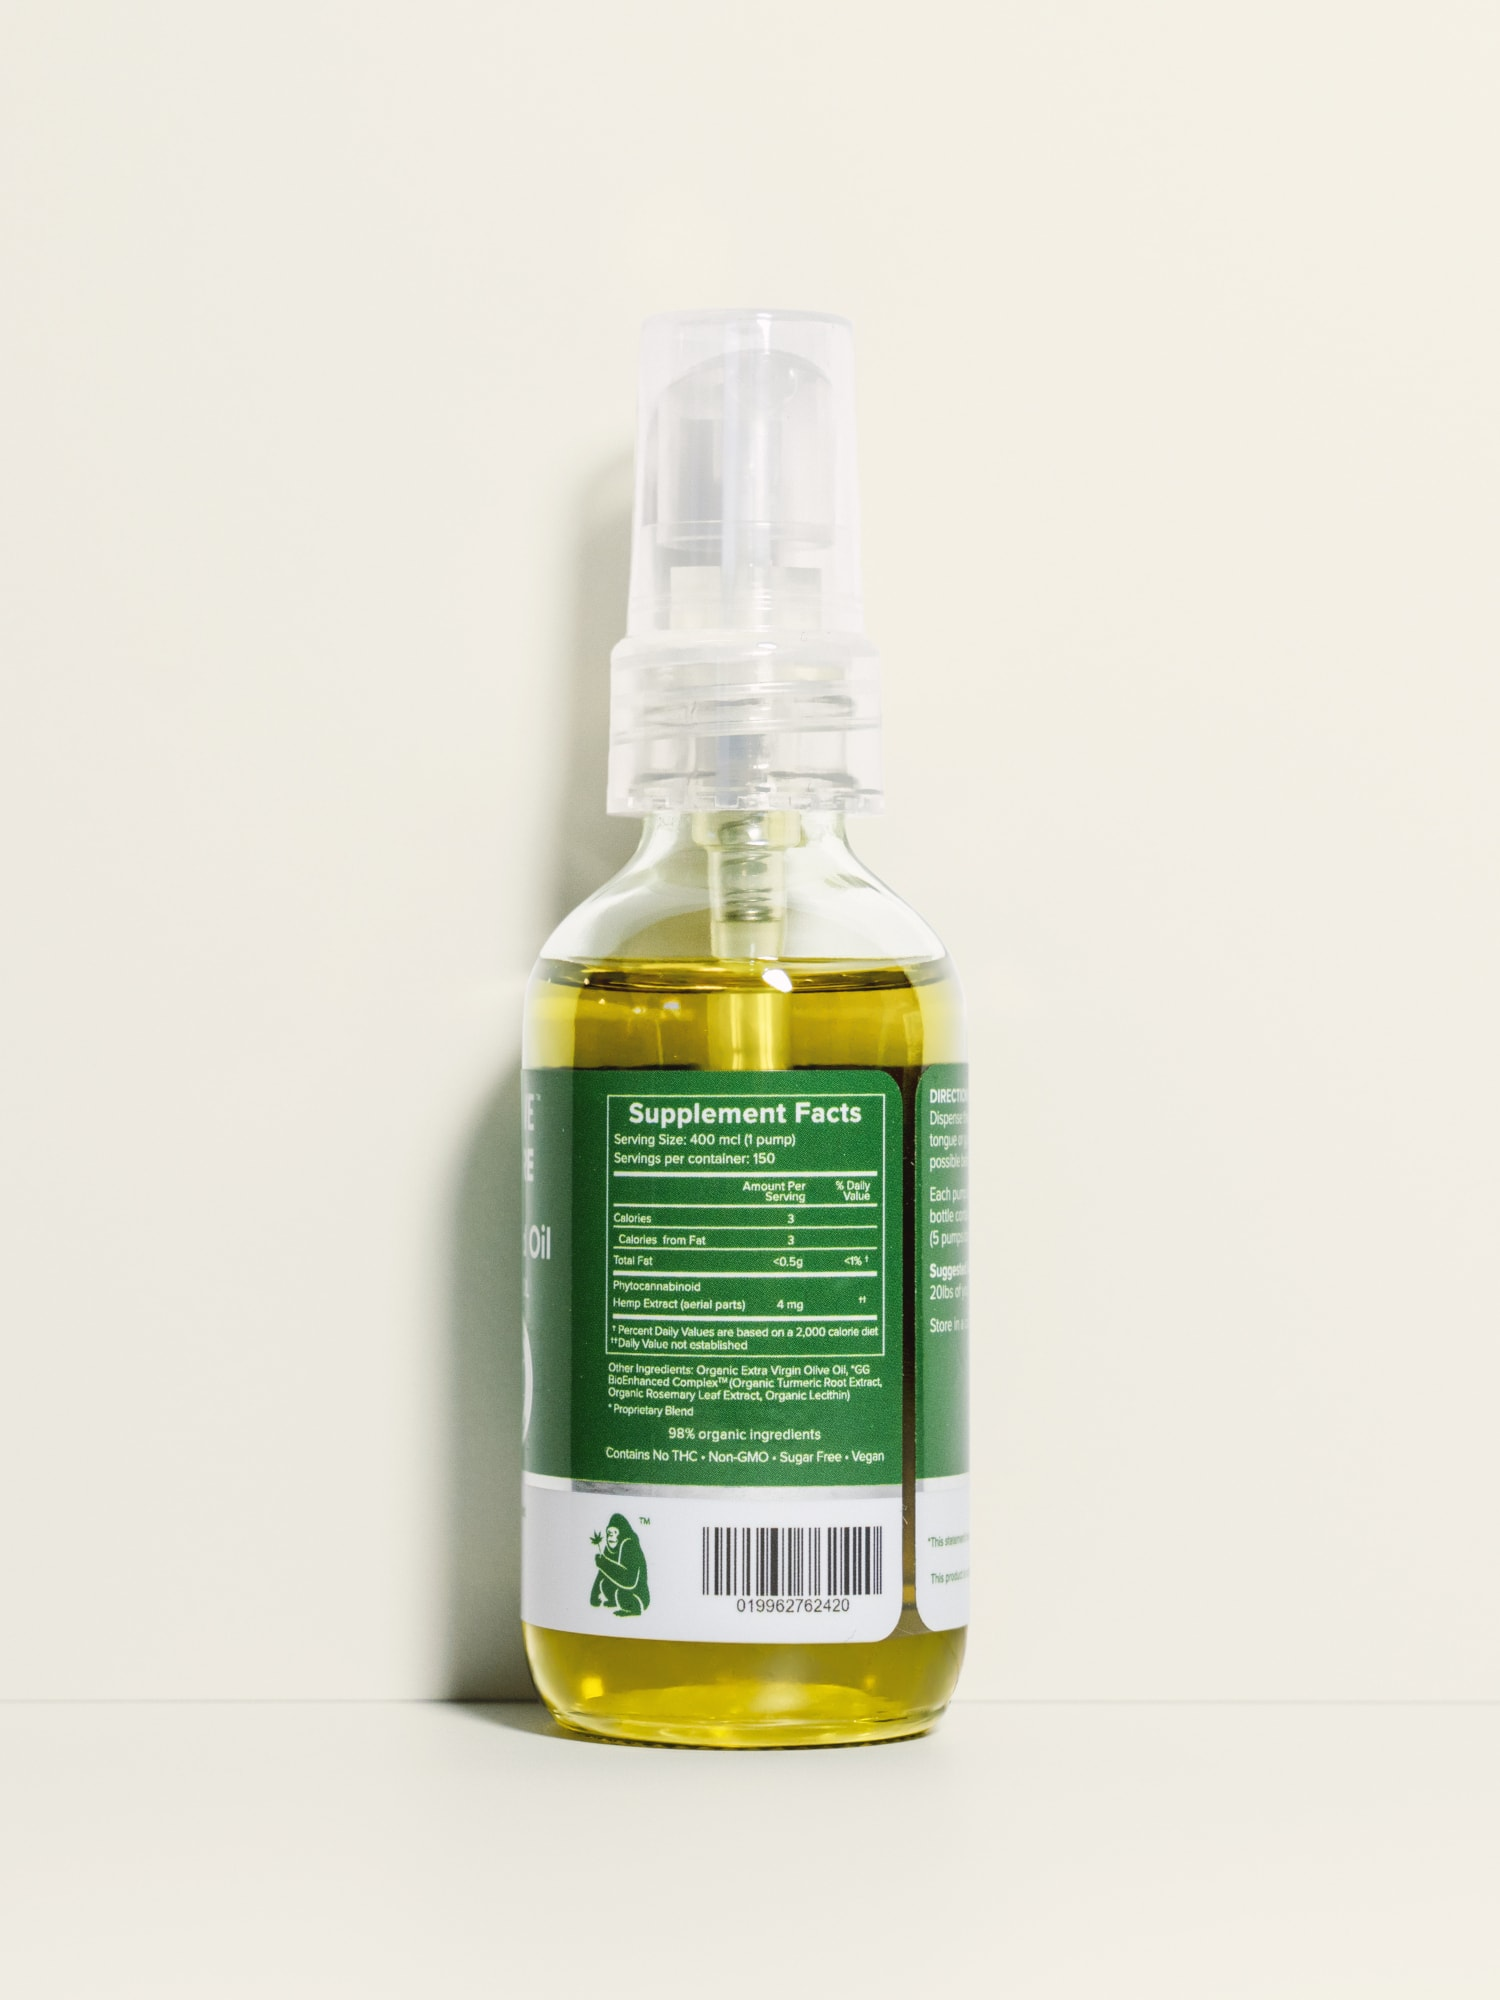 Buy Pure CBD Oil for Pets Hemp Infused 600 mg